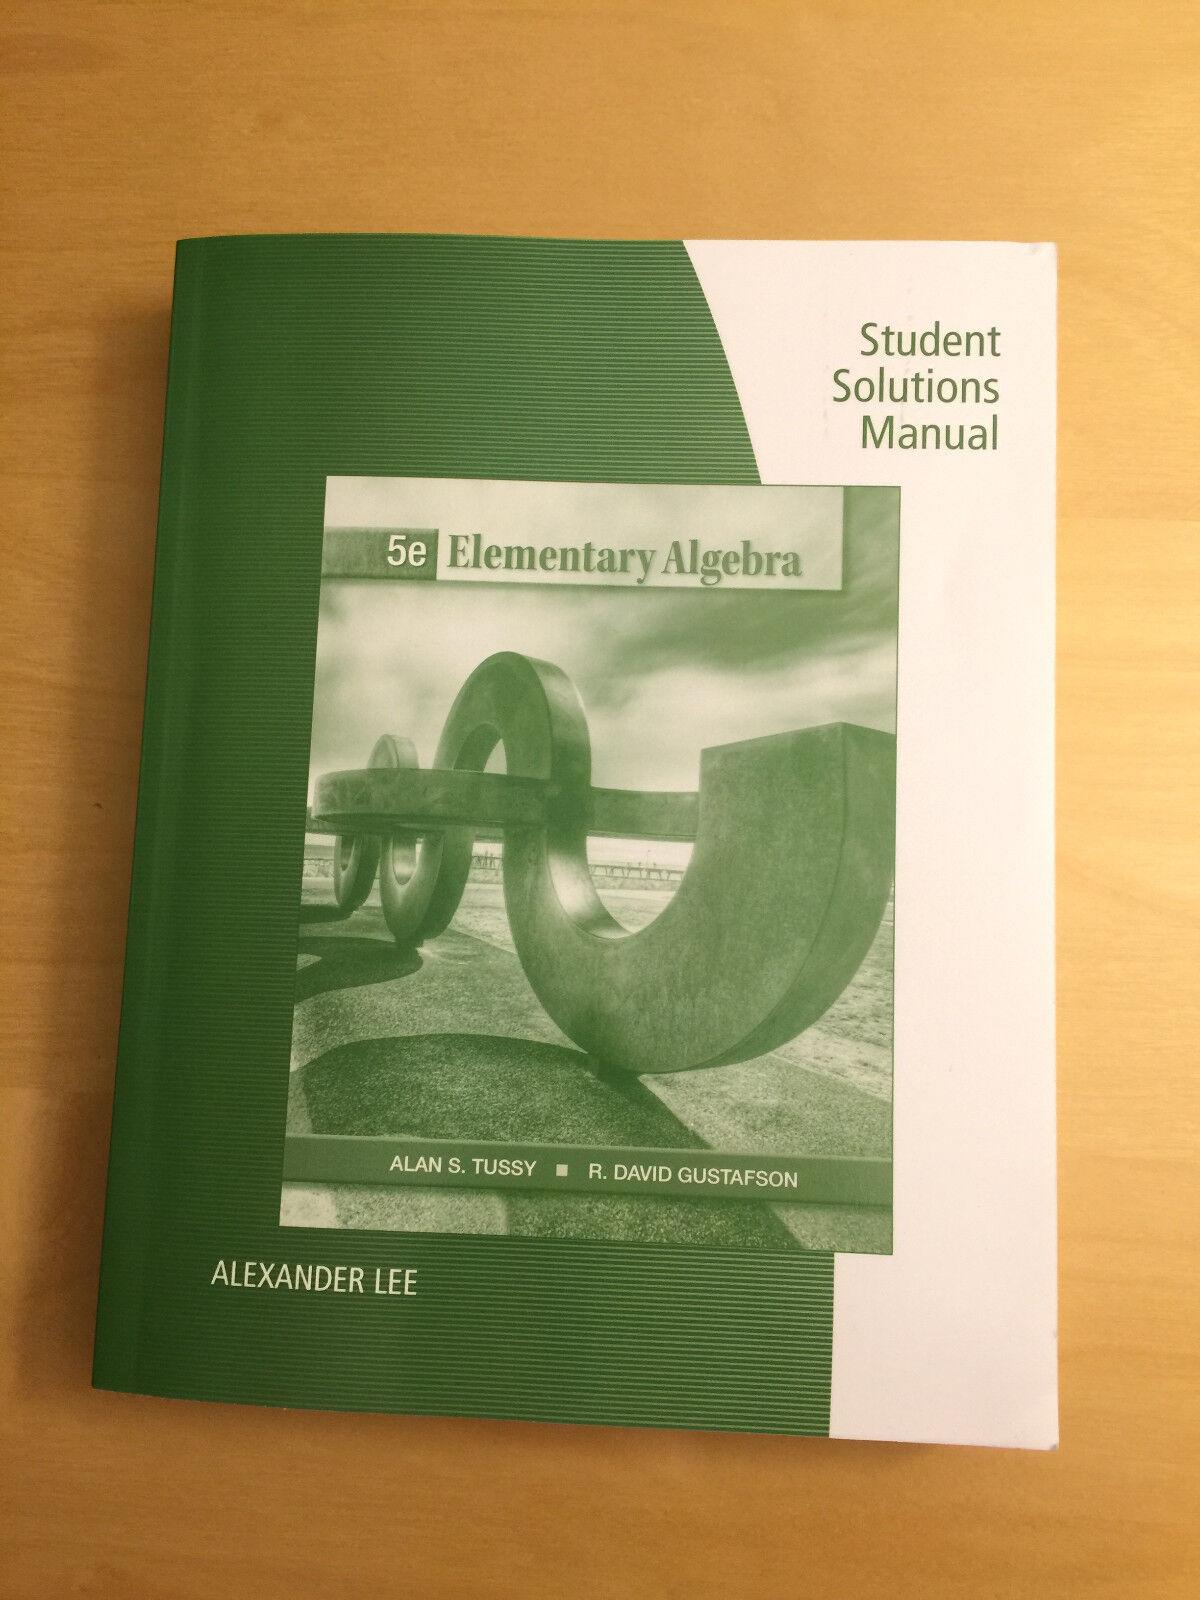 Elementary Algebra by R. David Gustafson and Alan S. Tussy (2012,  Paperback) | eBay